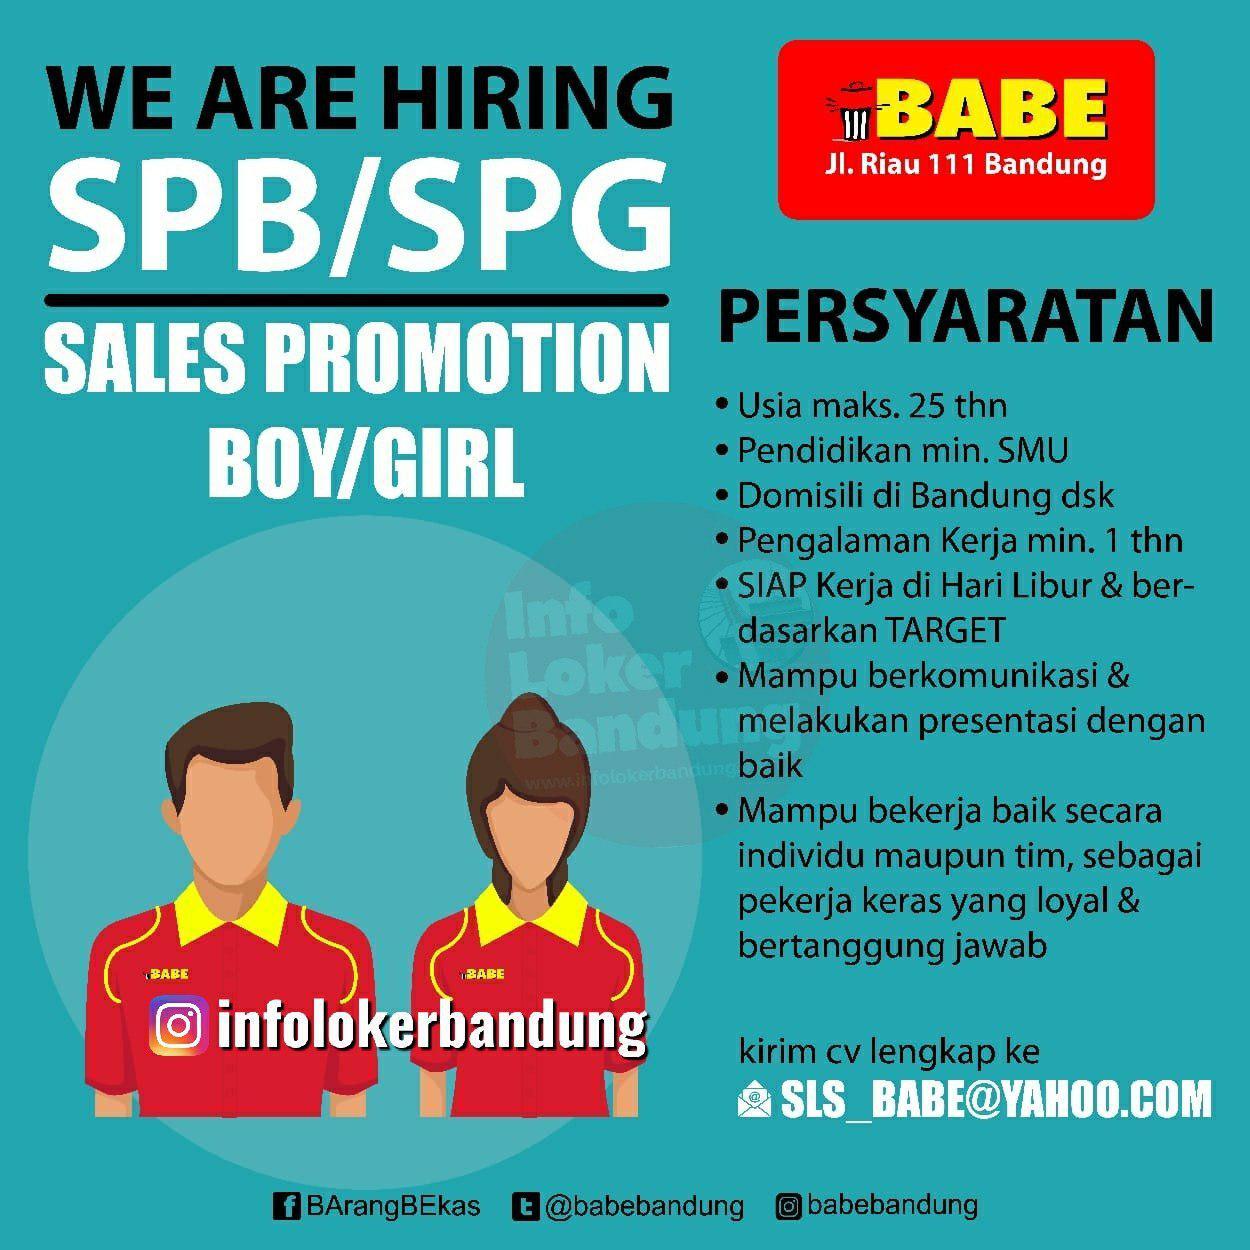 Lowongan Kerja Babe ( Barang Bekas) Bandung Oktober 2019